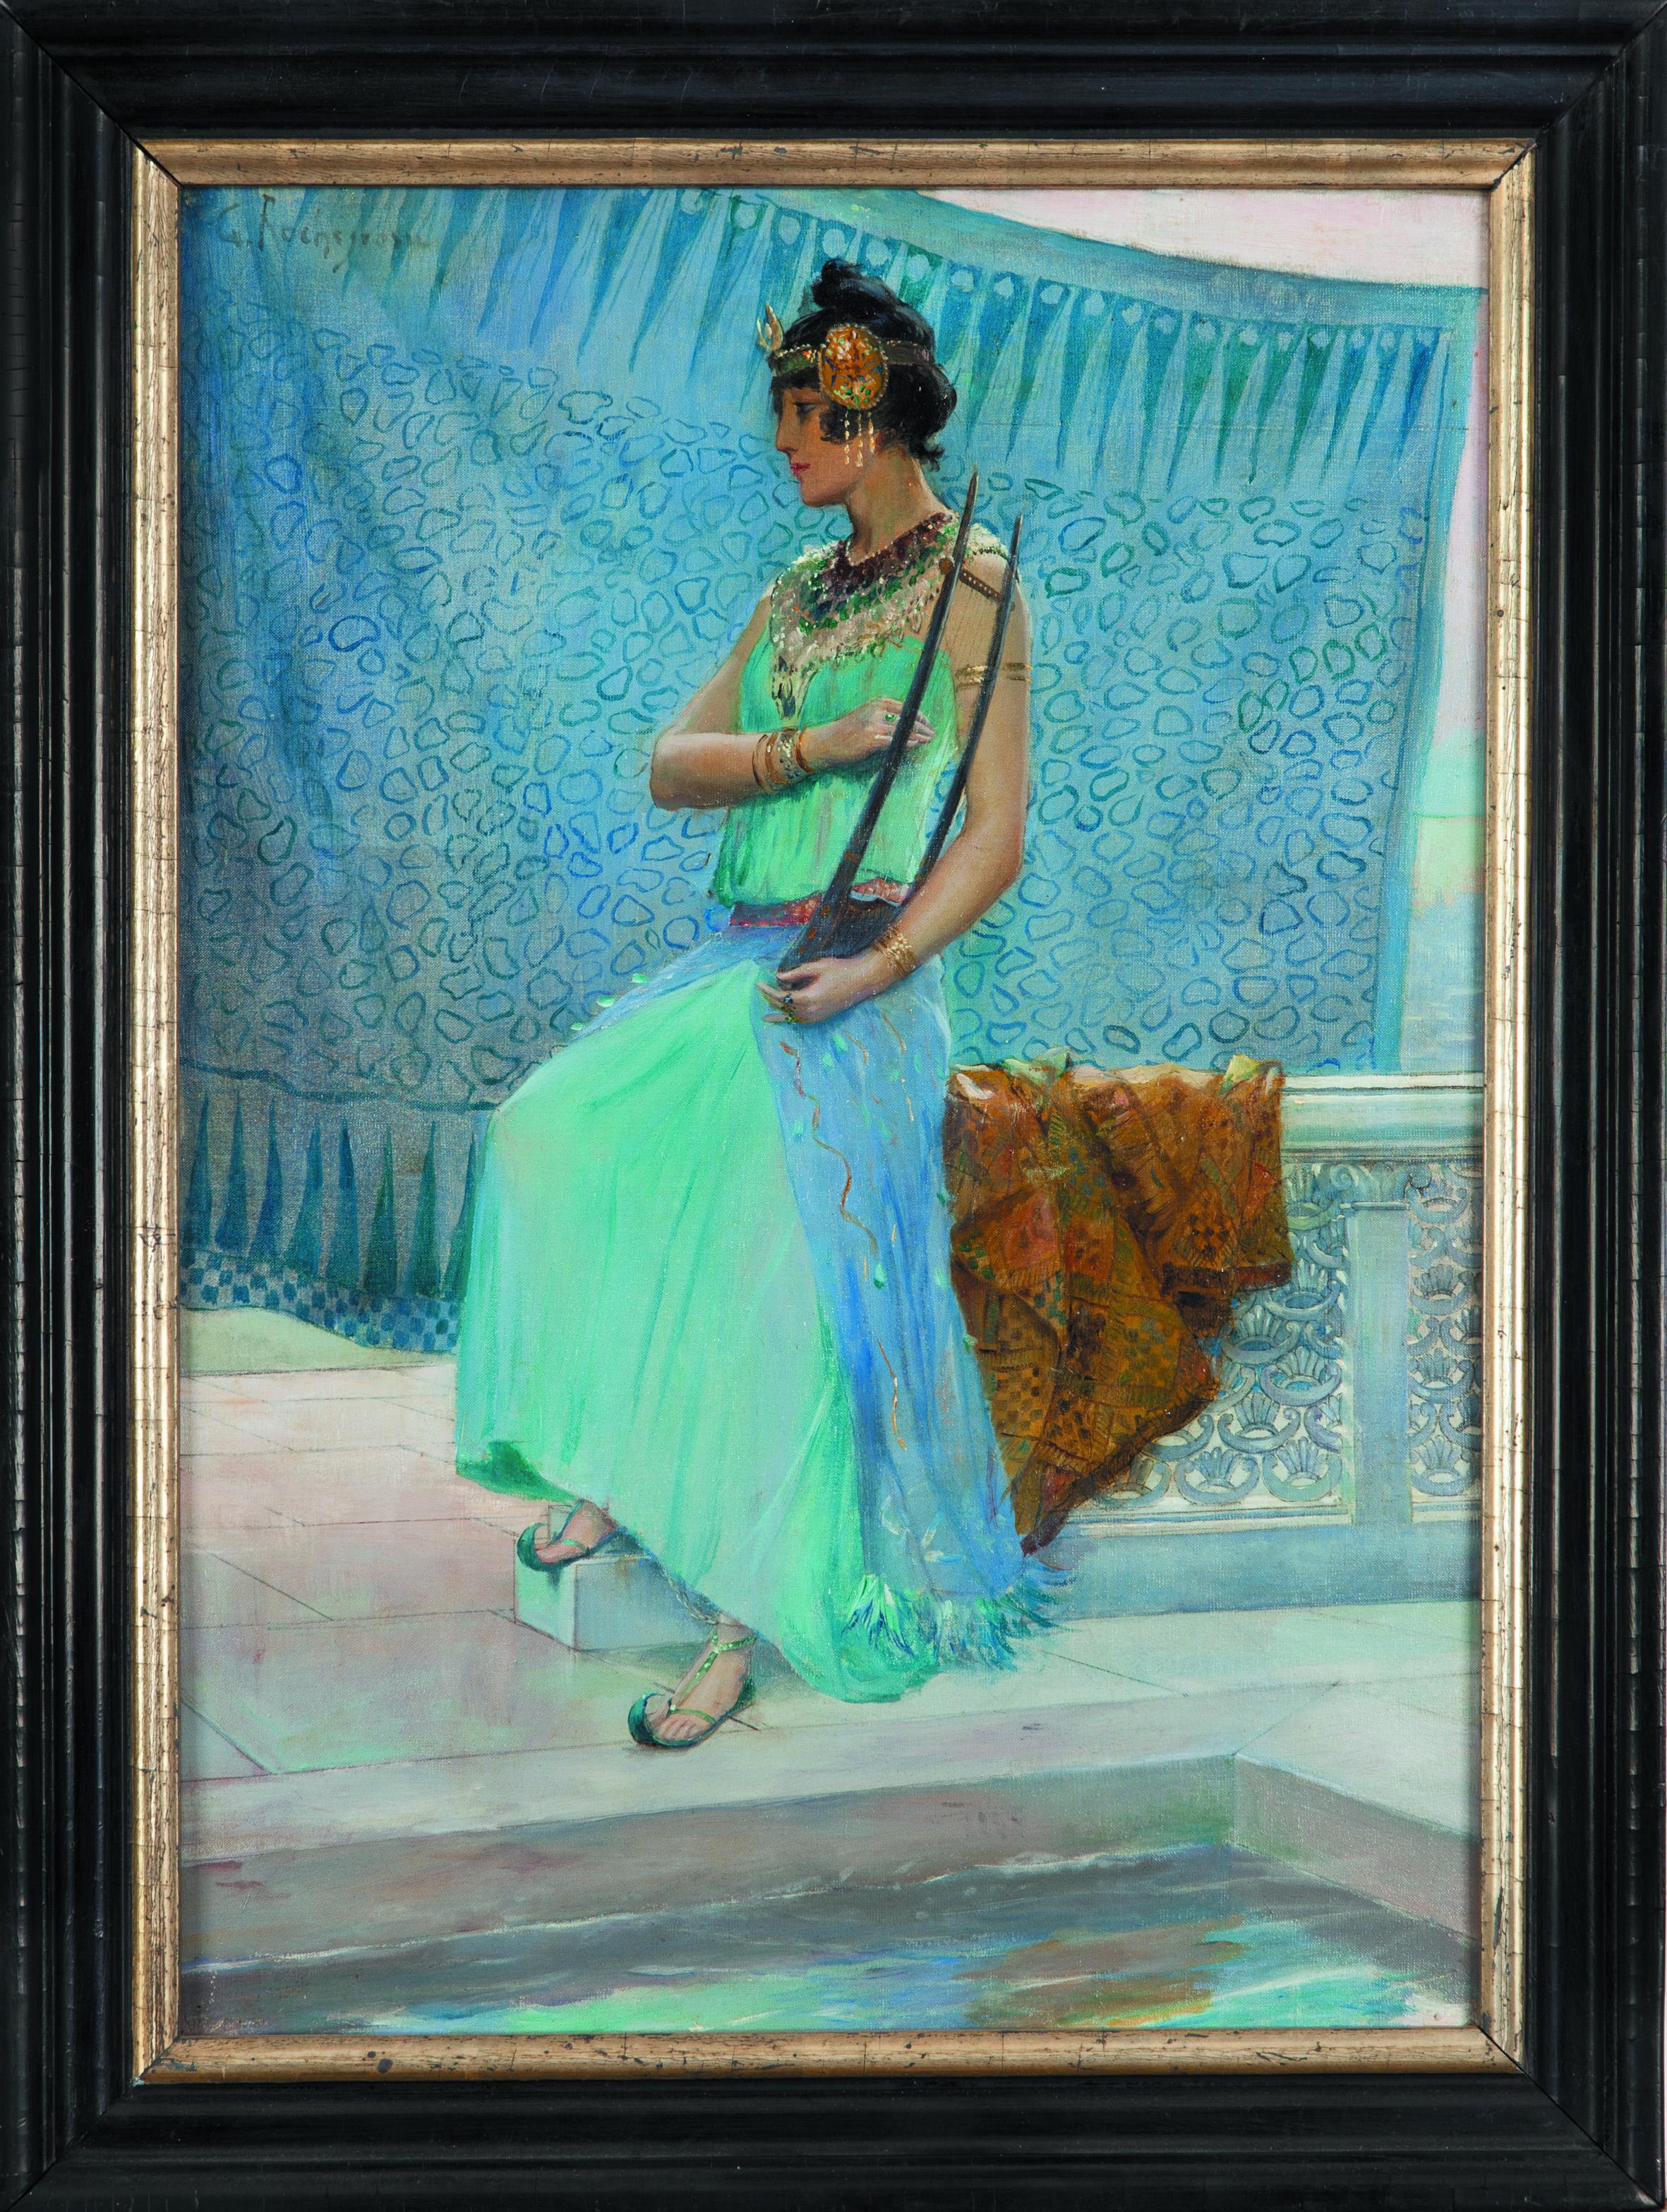 georges-antoine-rochegrosse-bailarina-argelina-o-salambo-1910-oleo-sobre-lienzo-musee-de-vendome-c-aurore